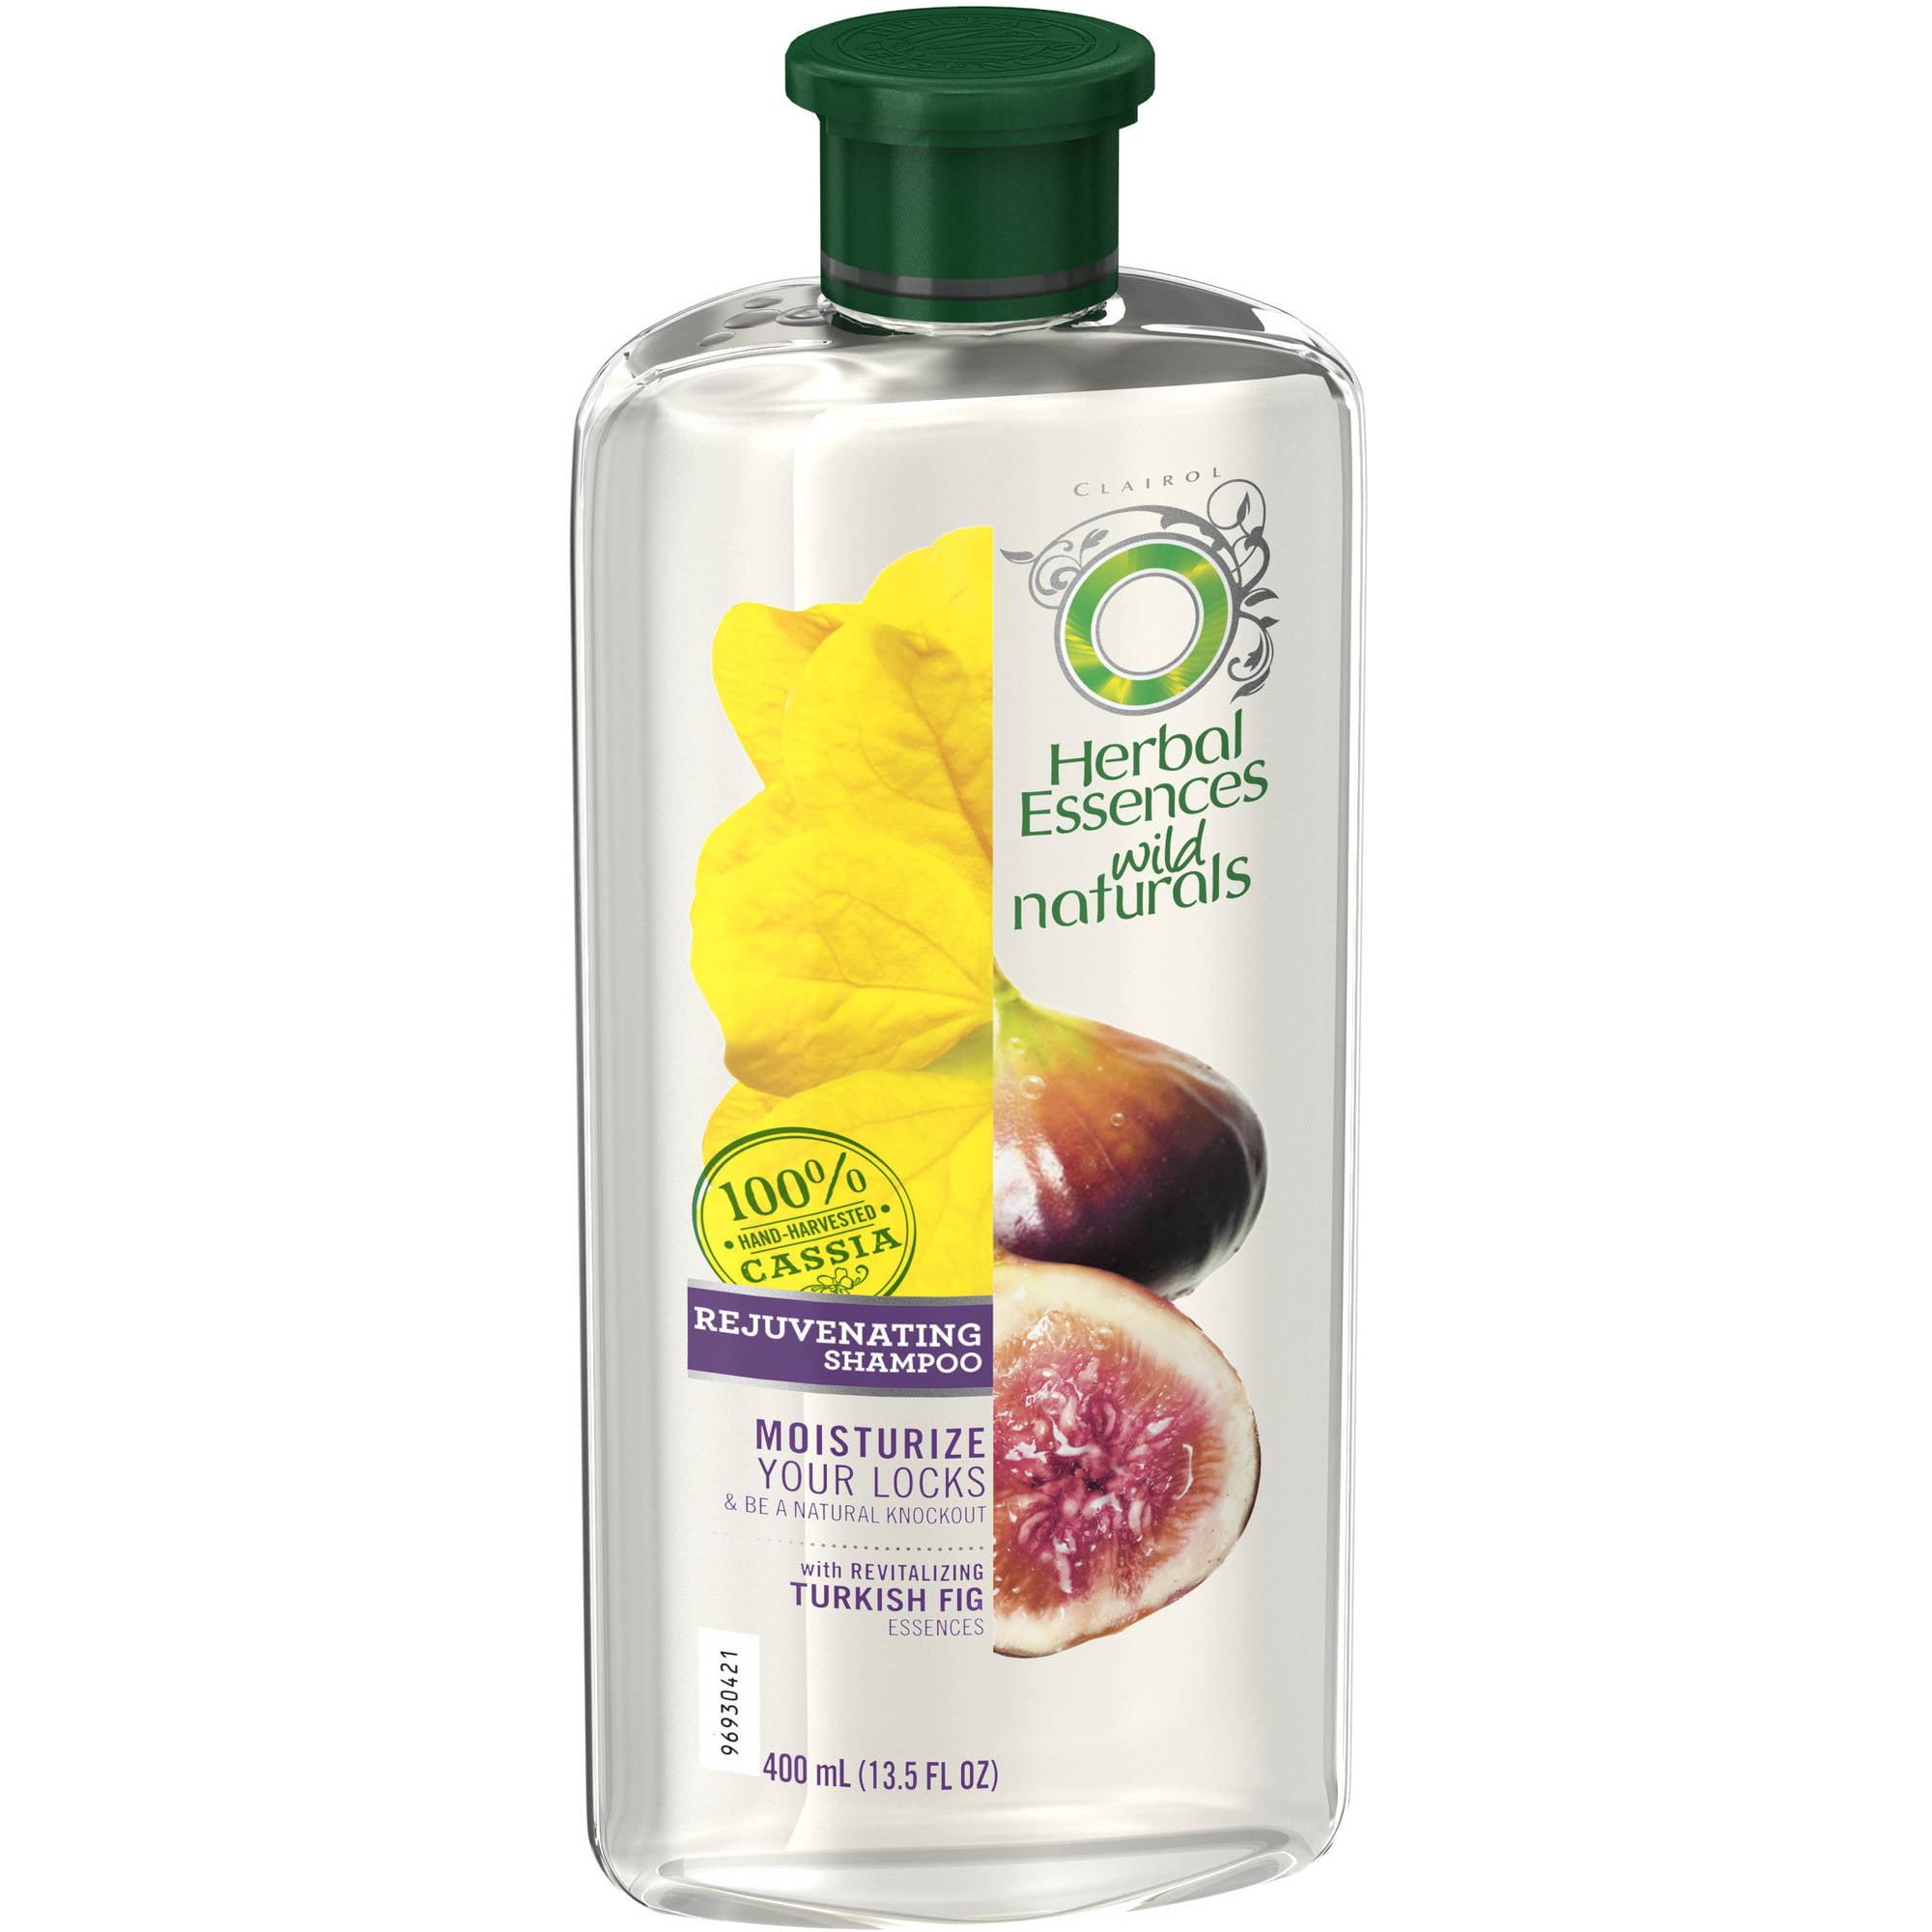 Herbal Essences Wild Naturals Rejuvenating Shampoo, 13.5 fl oz